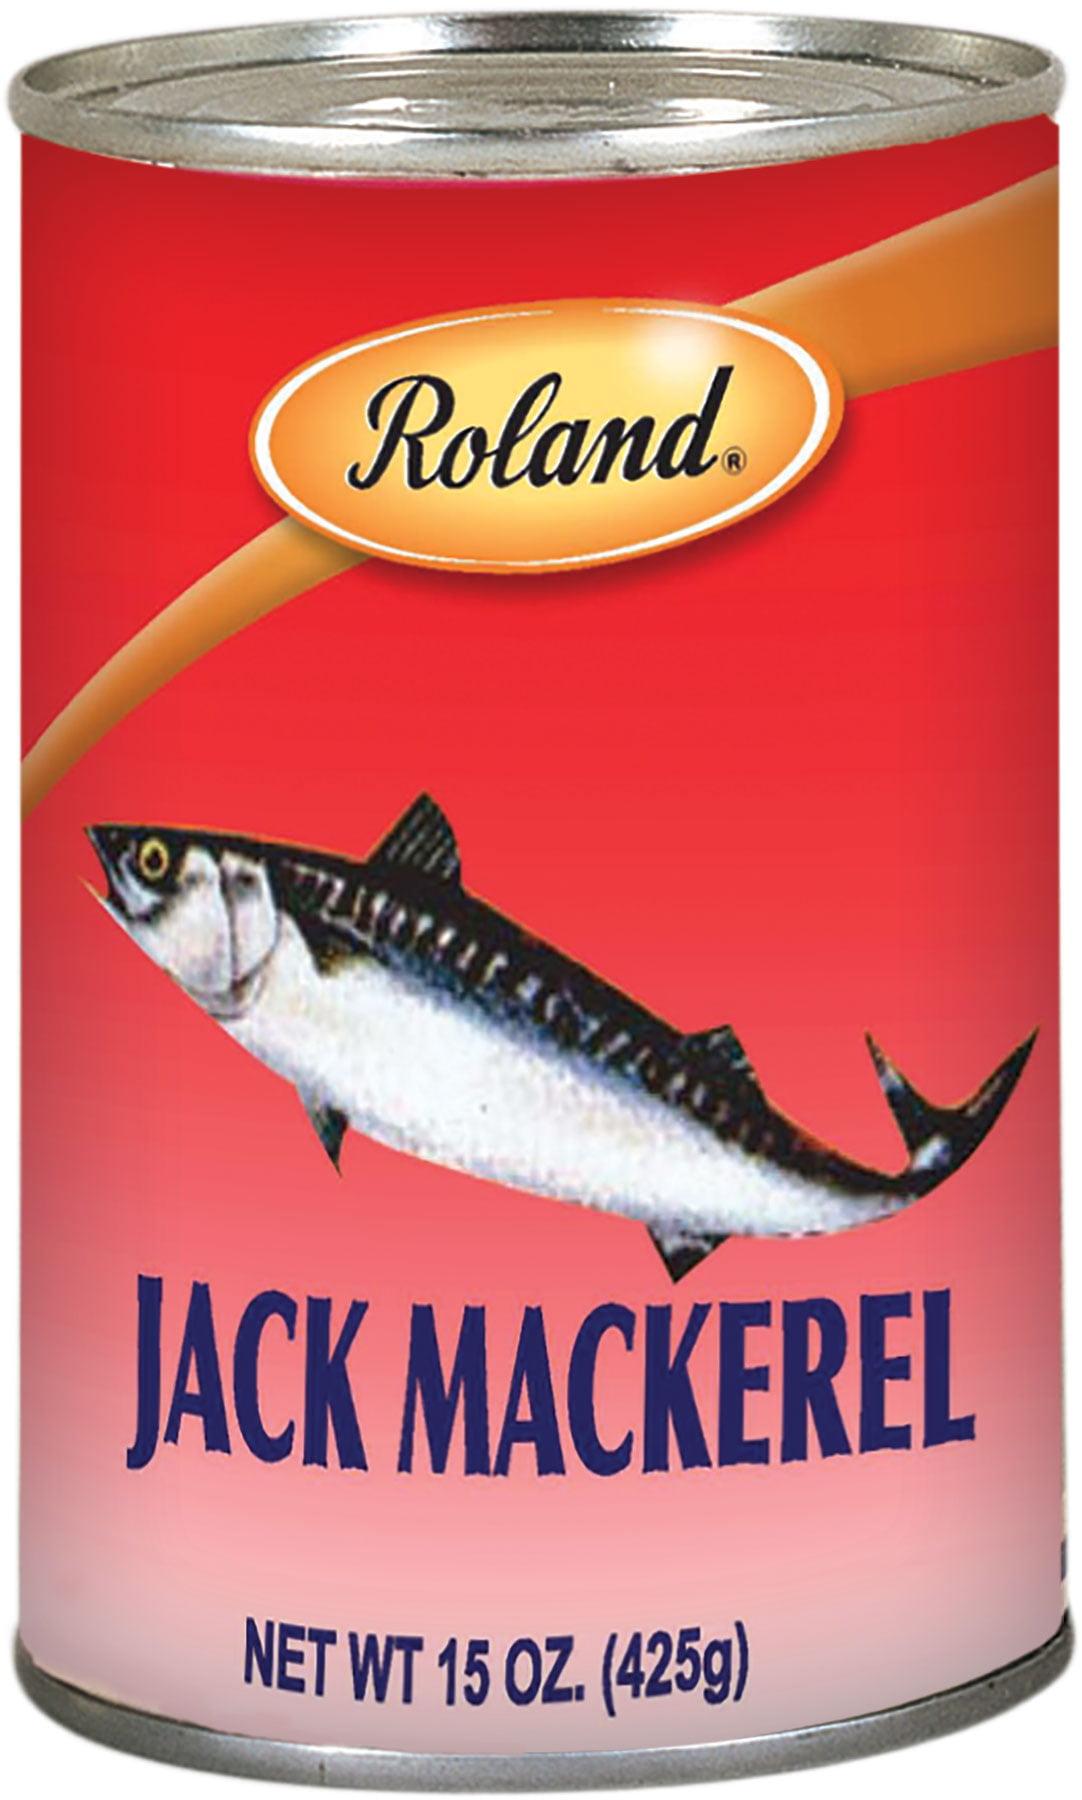 Roland Mackerel In Water, 15 Oz by Roland Corporation